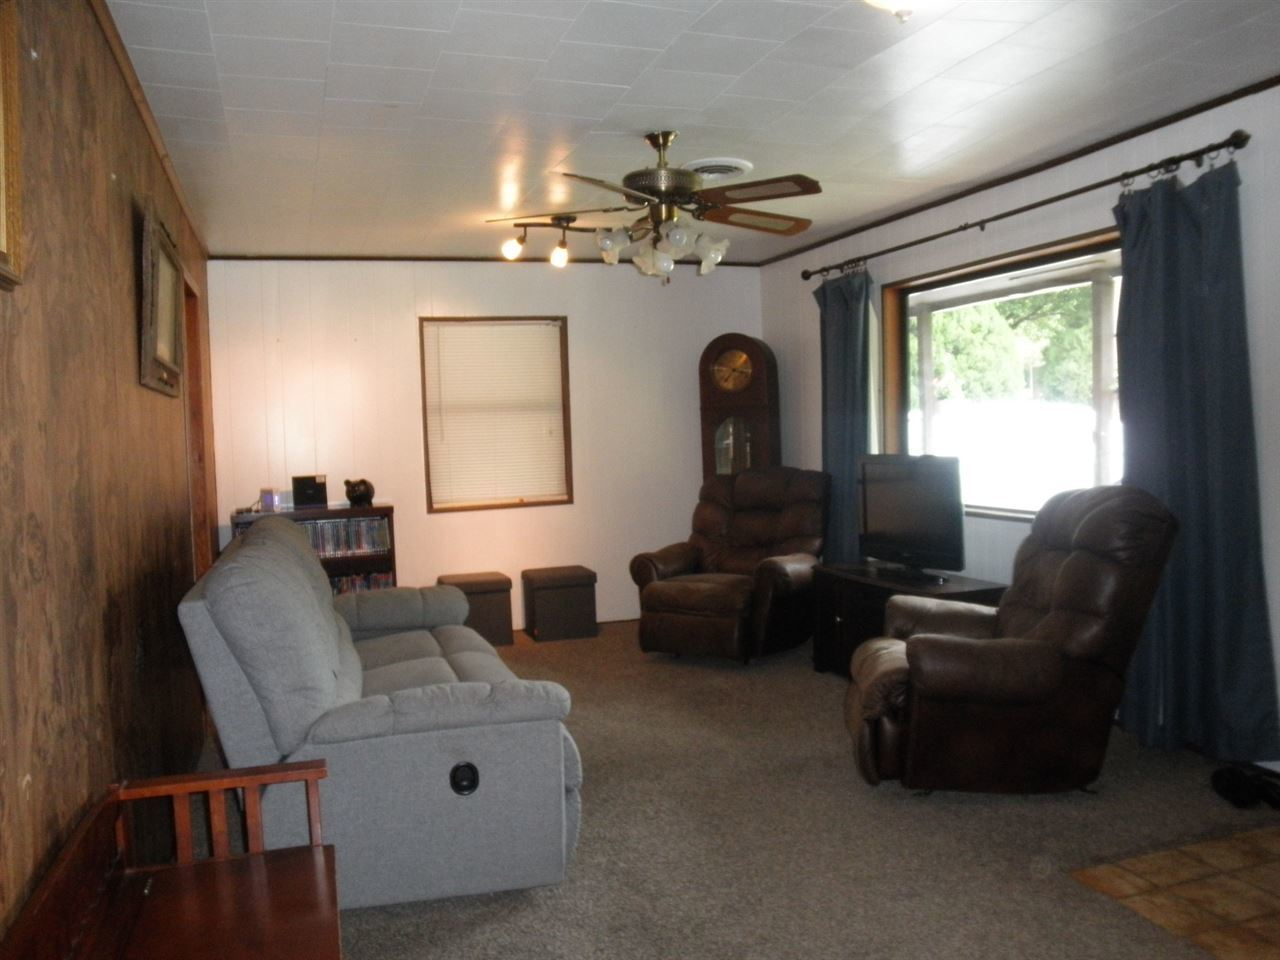 Sold Cross Sale W/ MLS | 808 Gray  Ponca City, OK 74604 1